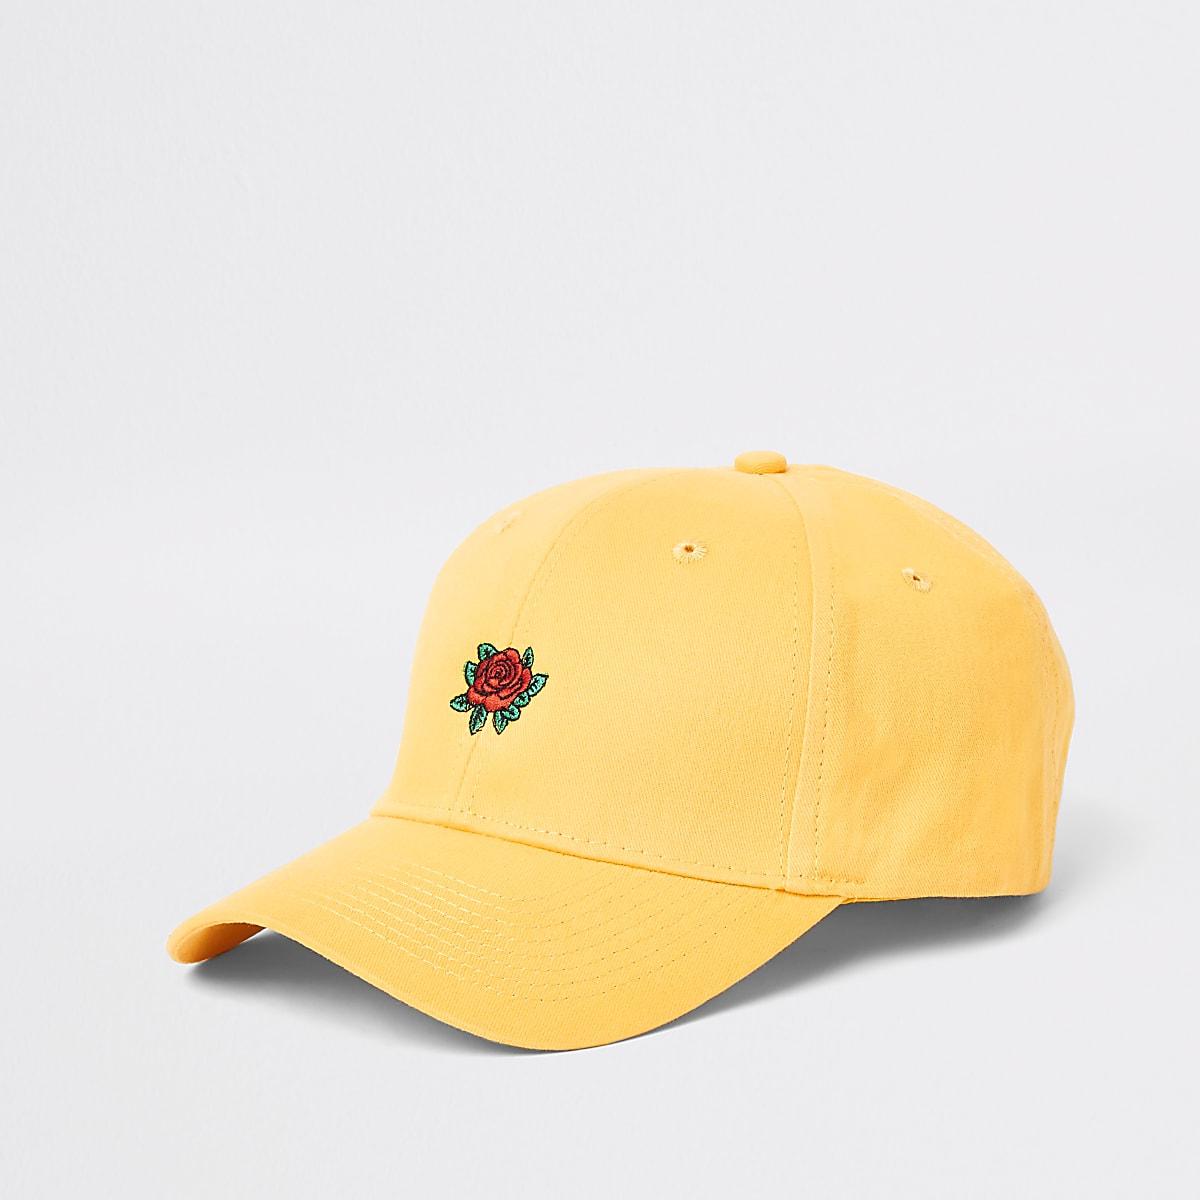 c2bebba19 Yellow rose embroidered baseball cap